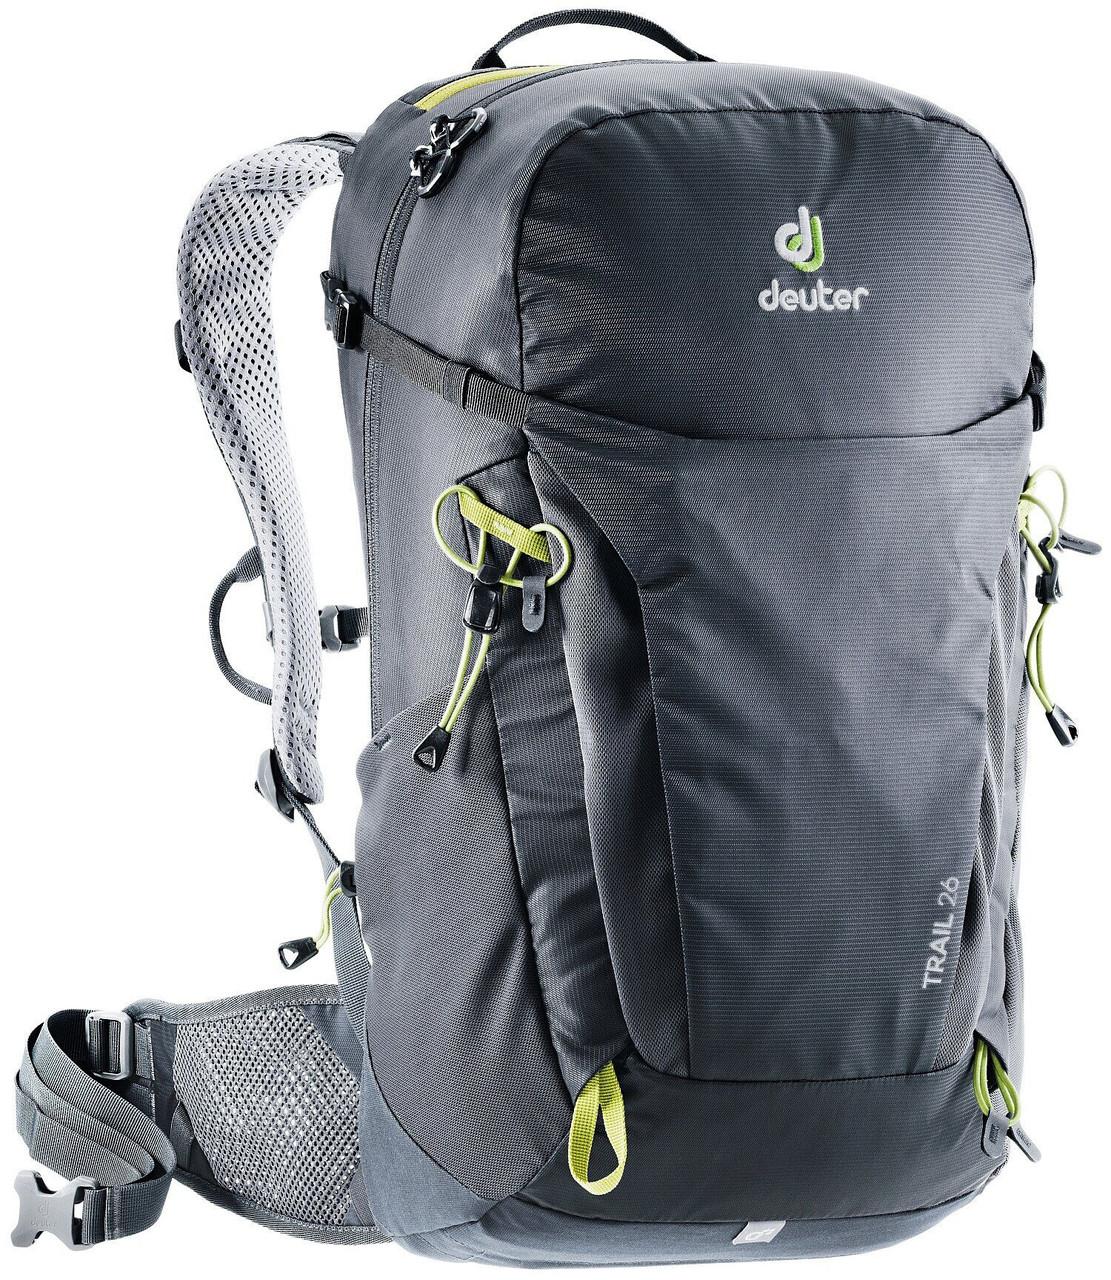 Рюкзак Deuter Trail 26 black-graphite (3440319 7403)